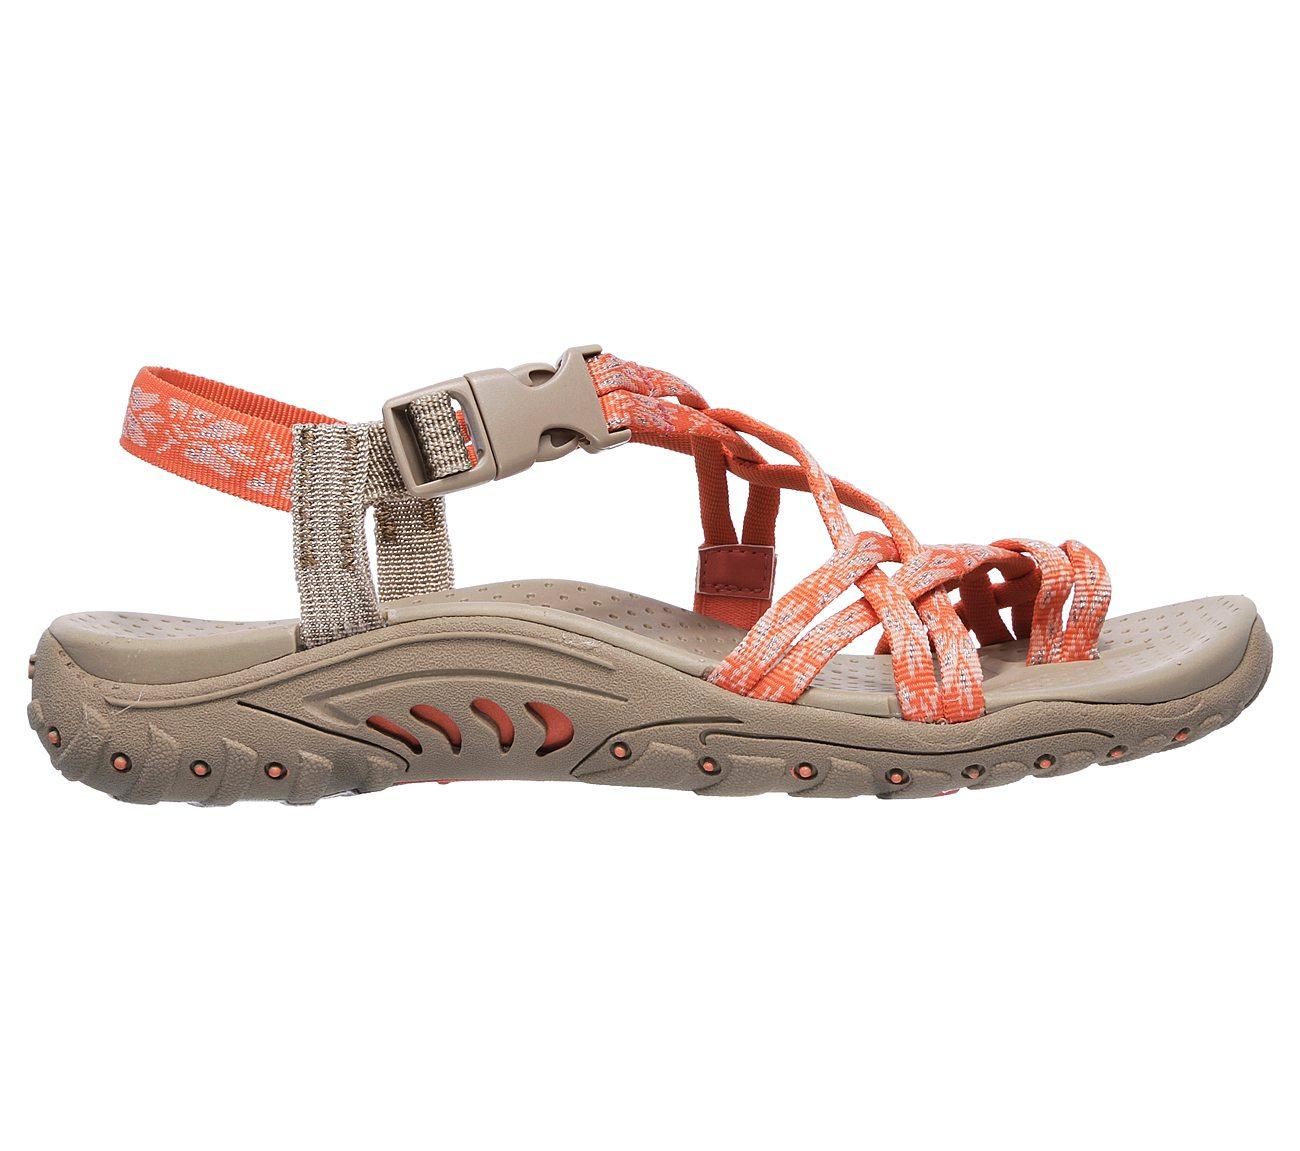 SKECHERS Reggae - Luau Modern Comfort Shoes